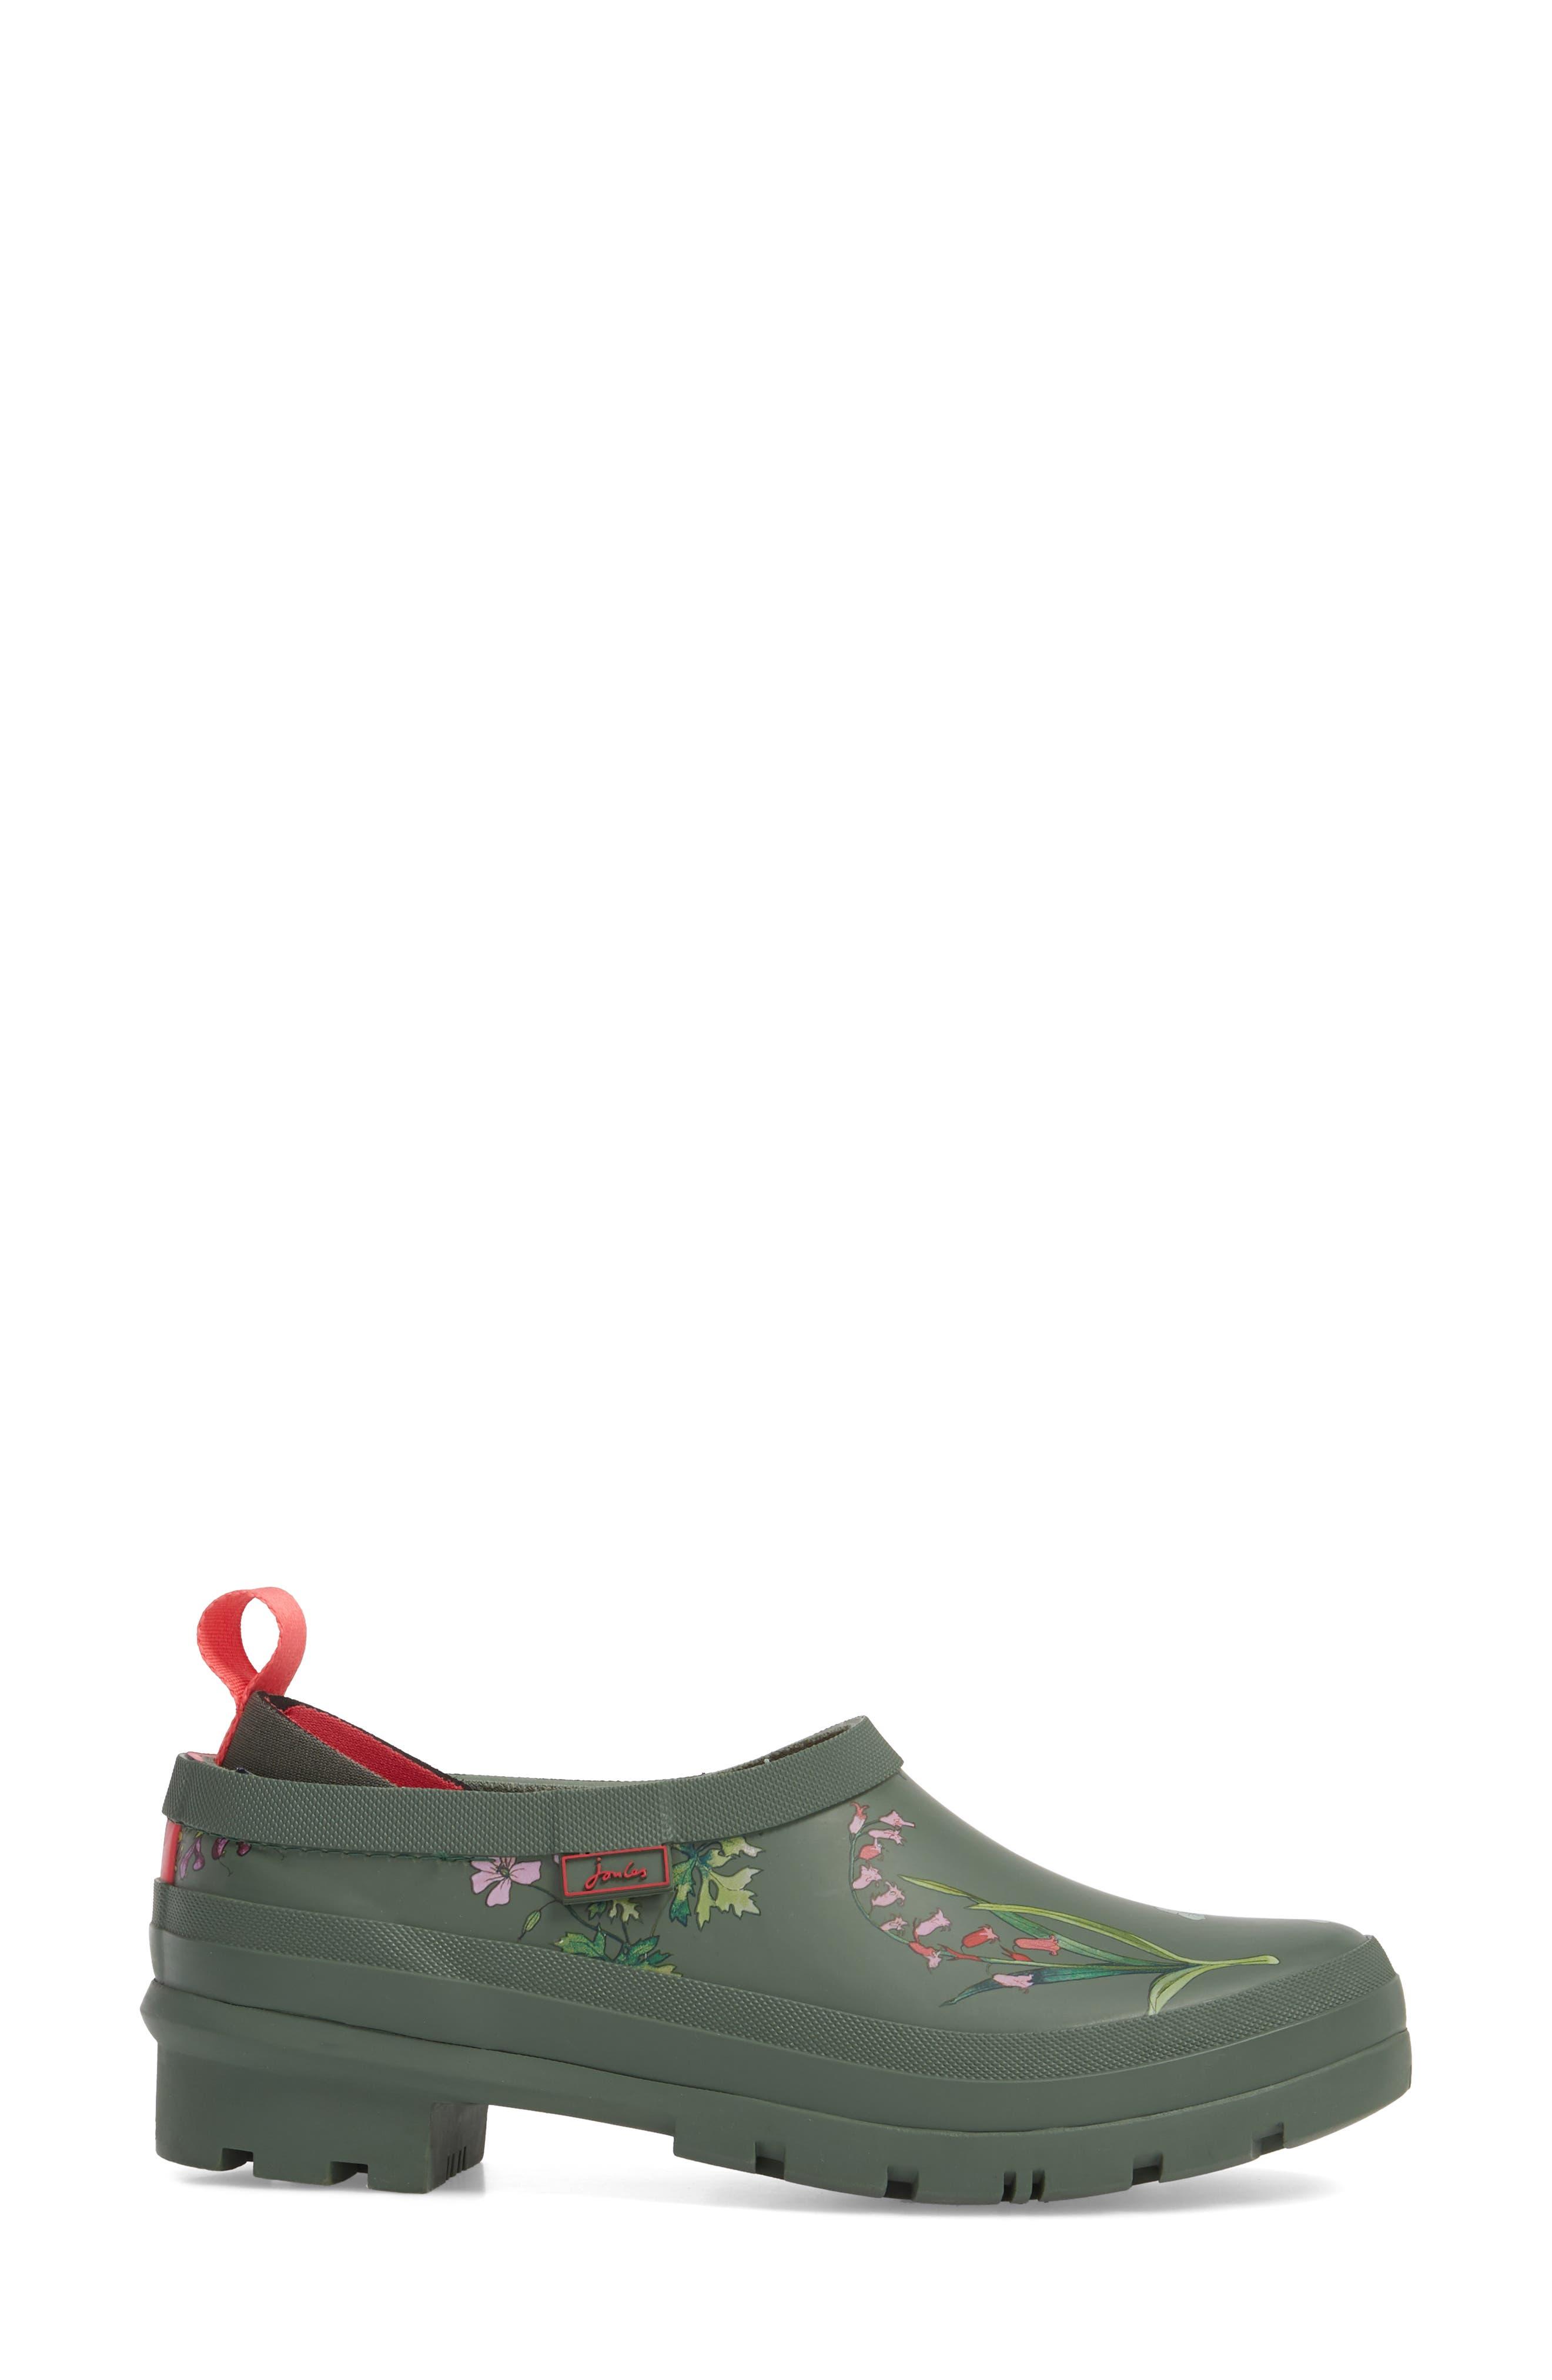 Rain Boot Clog,                             Alternate thumbnail 3, color,                             Laurel Botanical